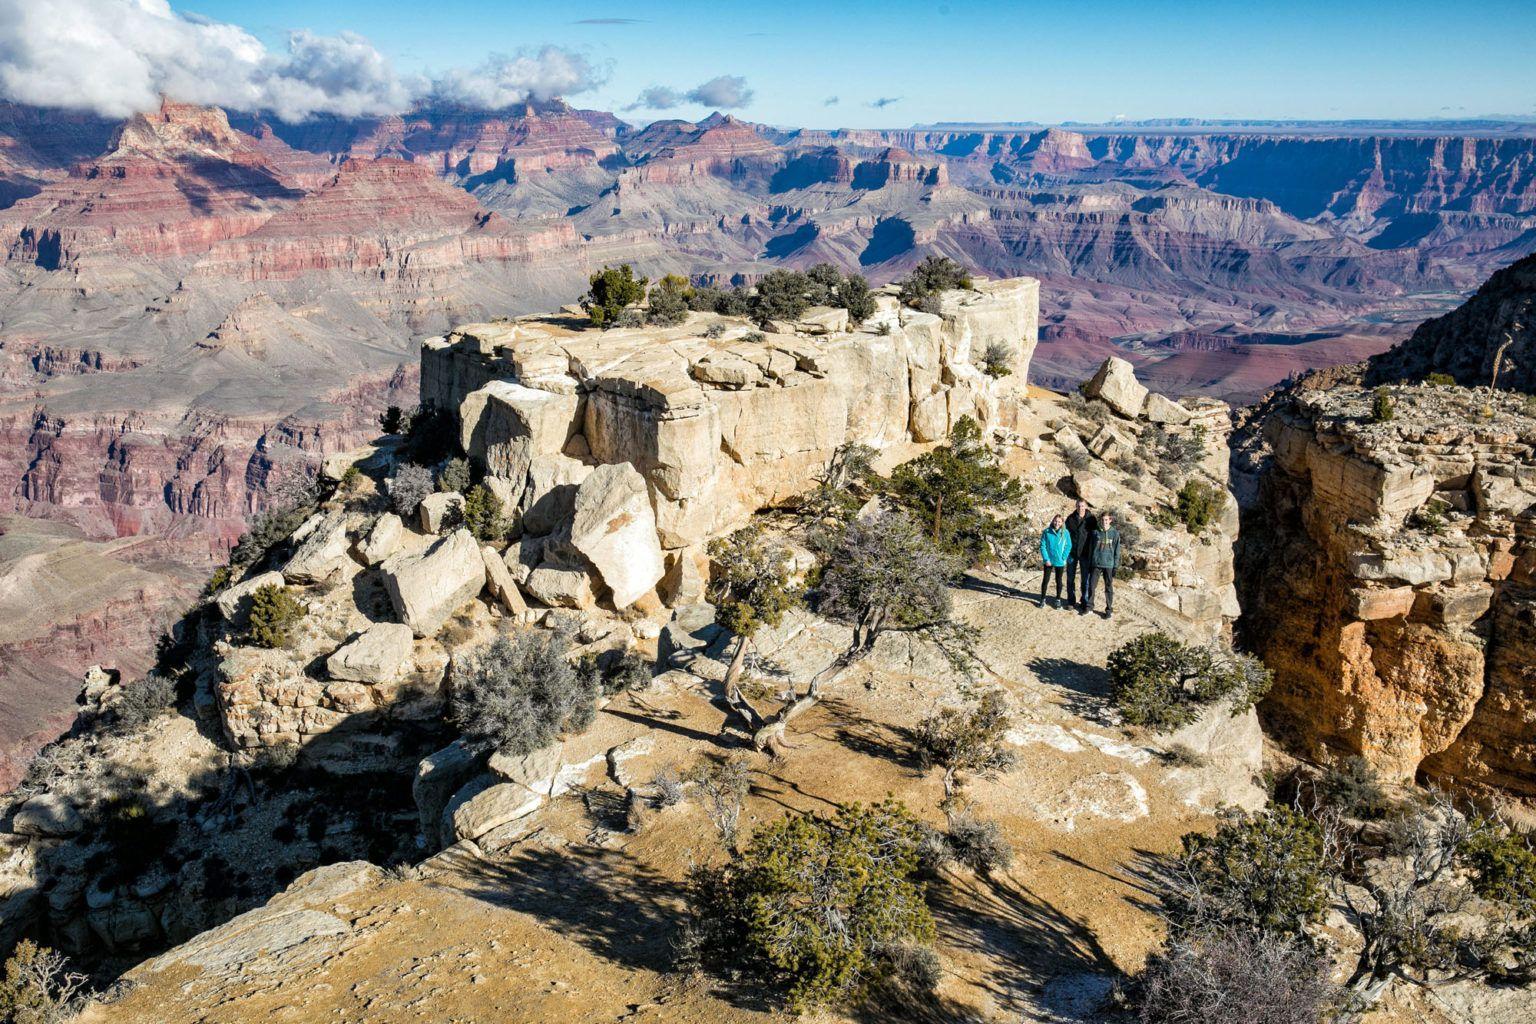 Moran Point Grand Canyon